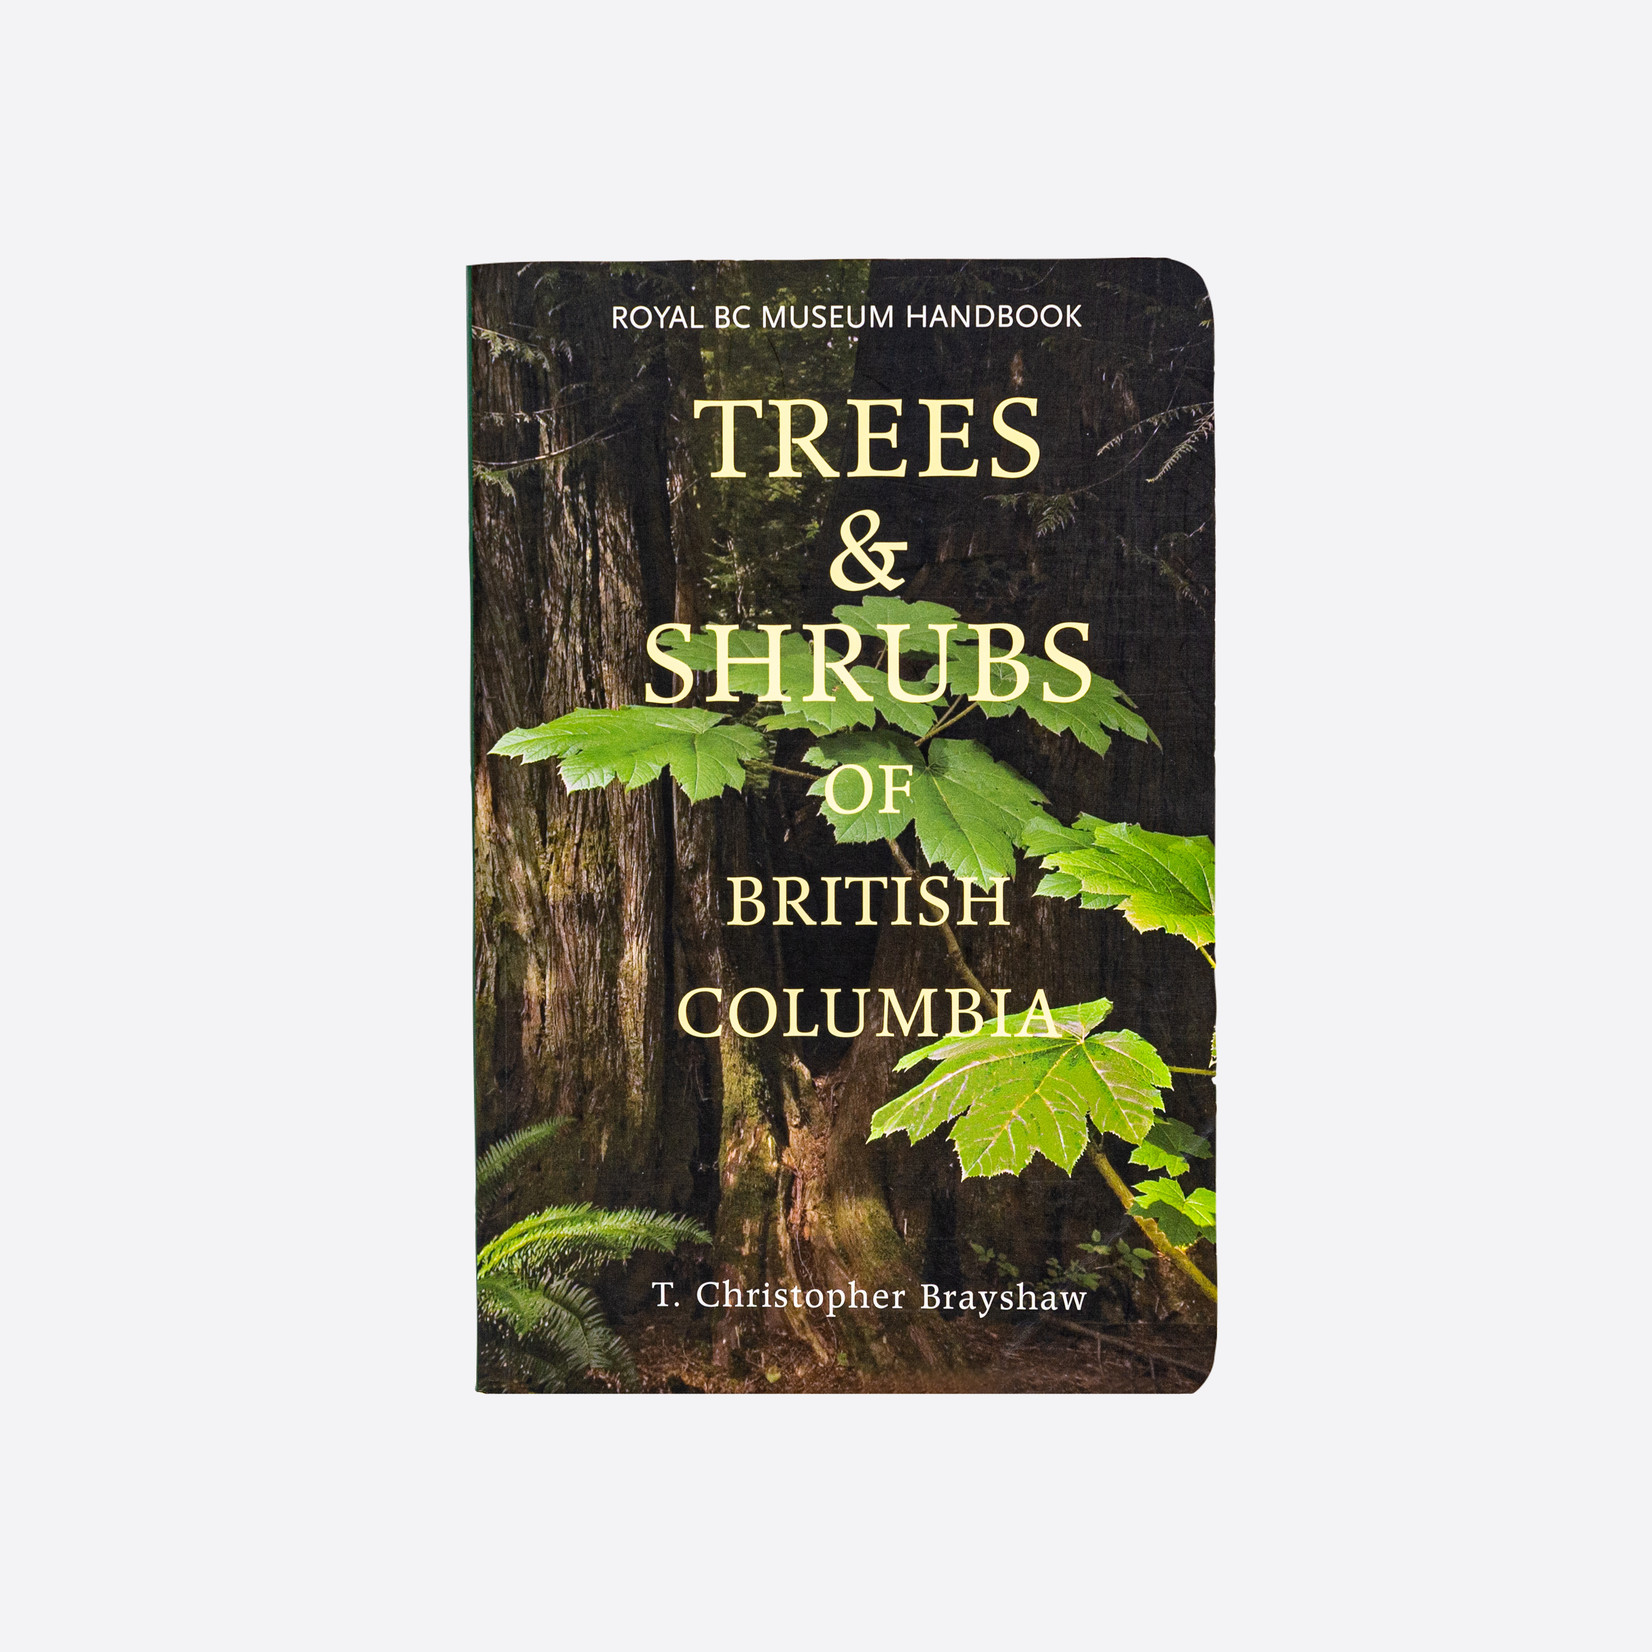 Trees & Shrubs of BC